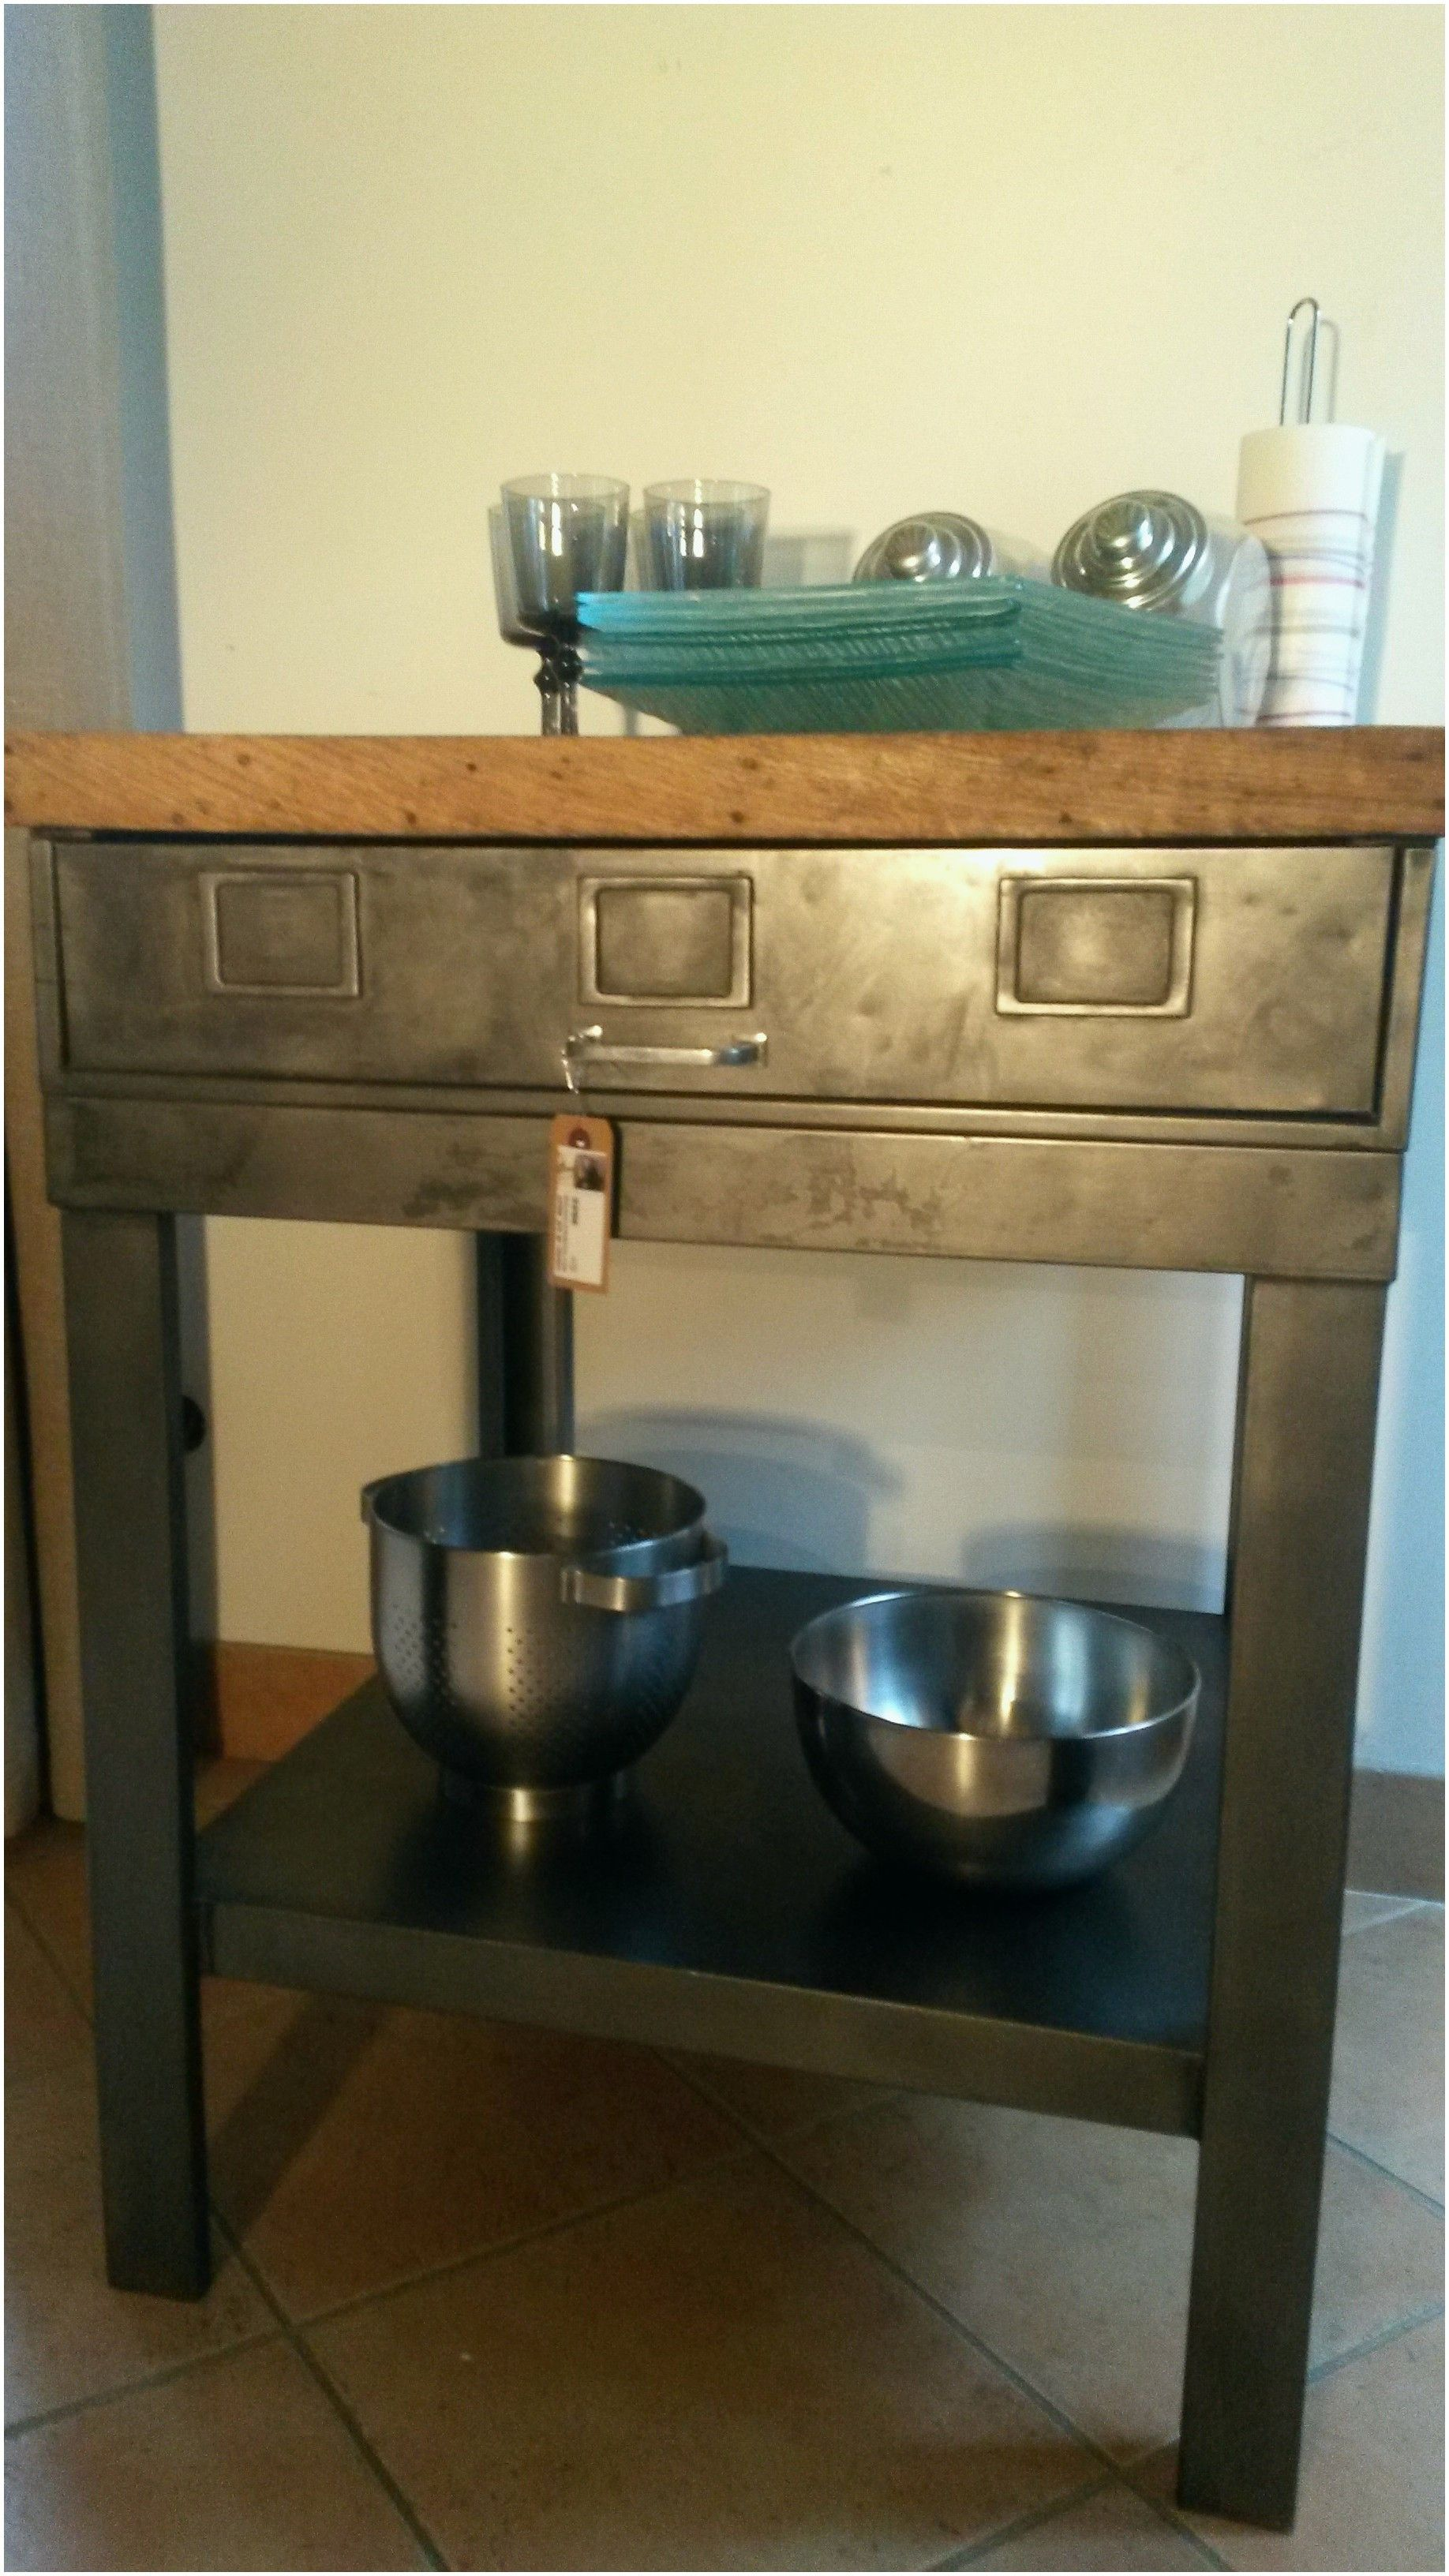 New Dimension Element Cuisine  Kitchen design, Cuisine ikea